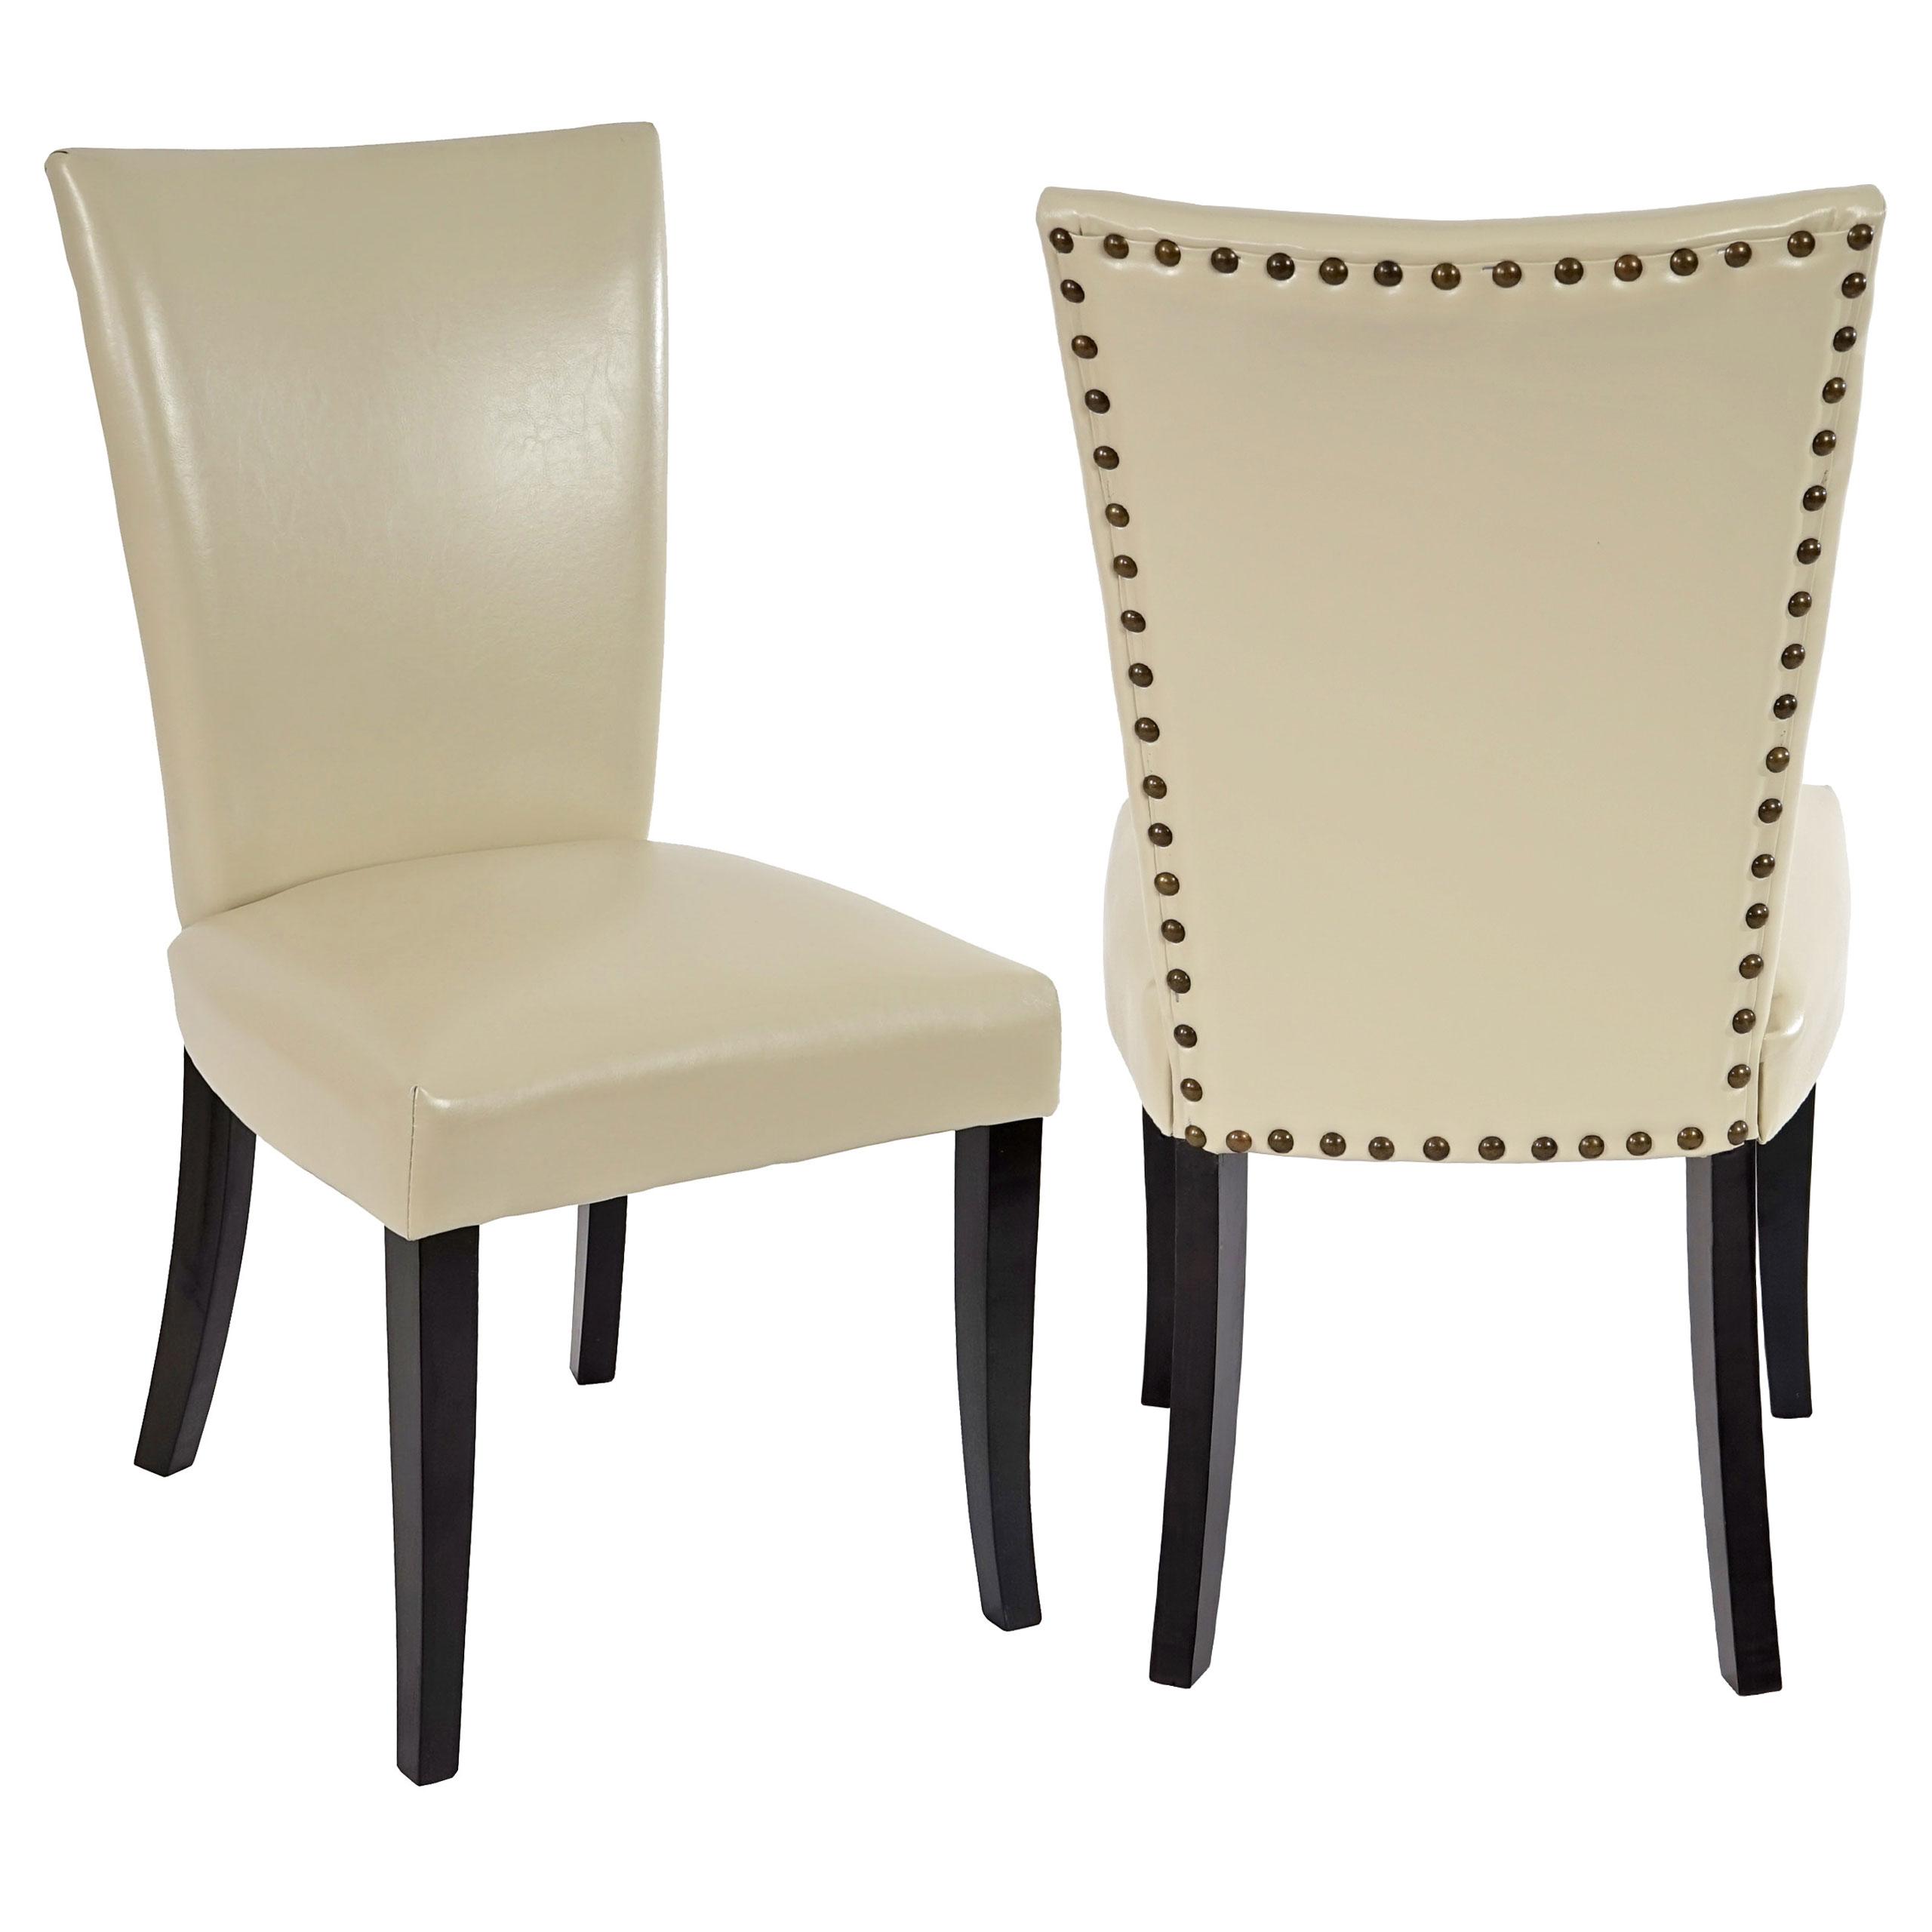 2x esszimmerstuhl chesterfield stuhl lehnstuhl nieten kunstleder creme dunkle beine. Black Bedroom Furniture Sets. Home Design Ideas